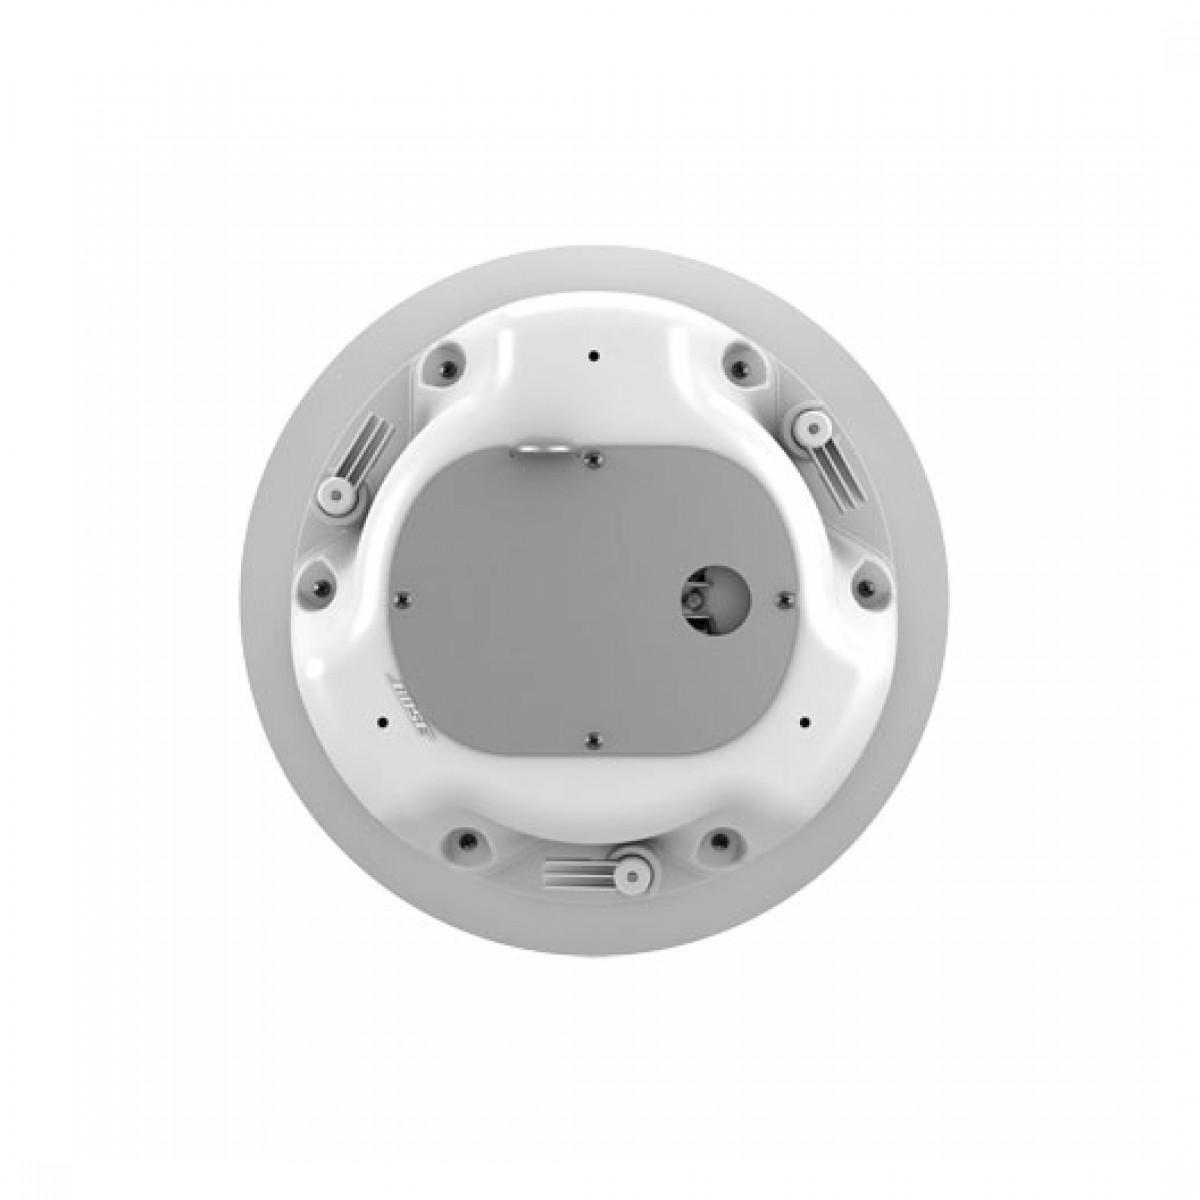 Bose FreeSpace DS 16F Loudspeaker White Installation Speakers